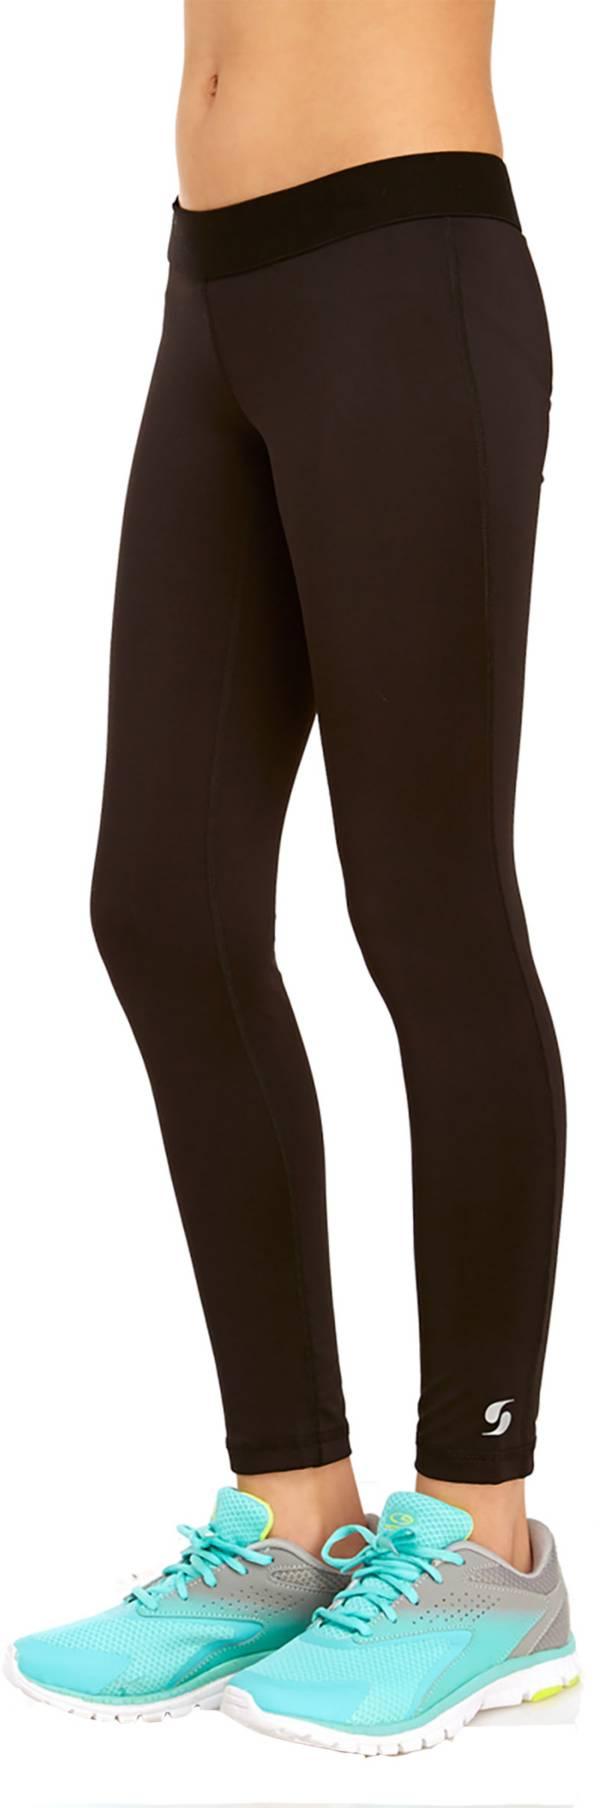 Soffe Girls' Dri Leggings product image